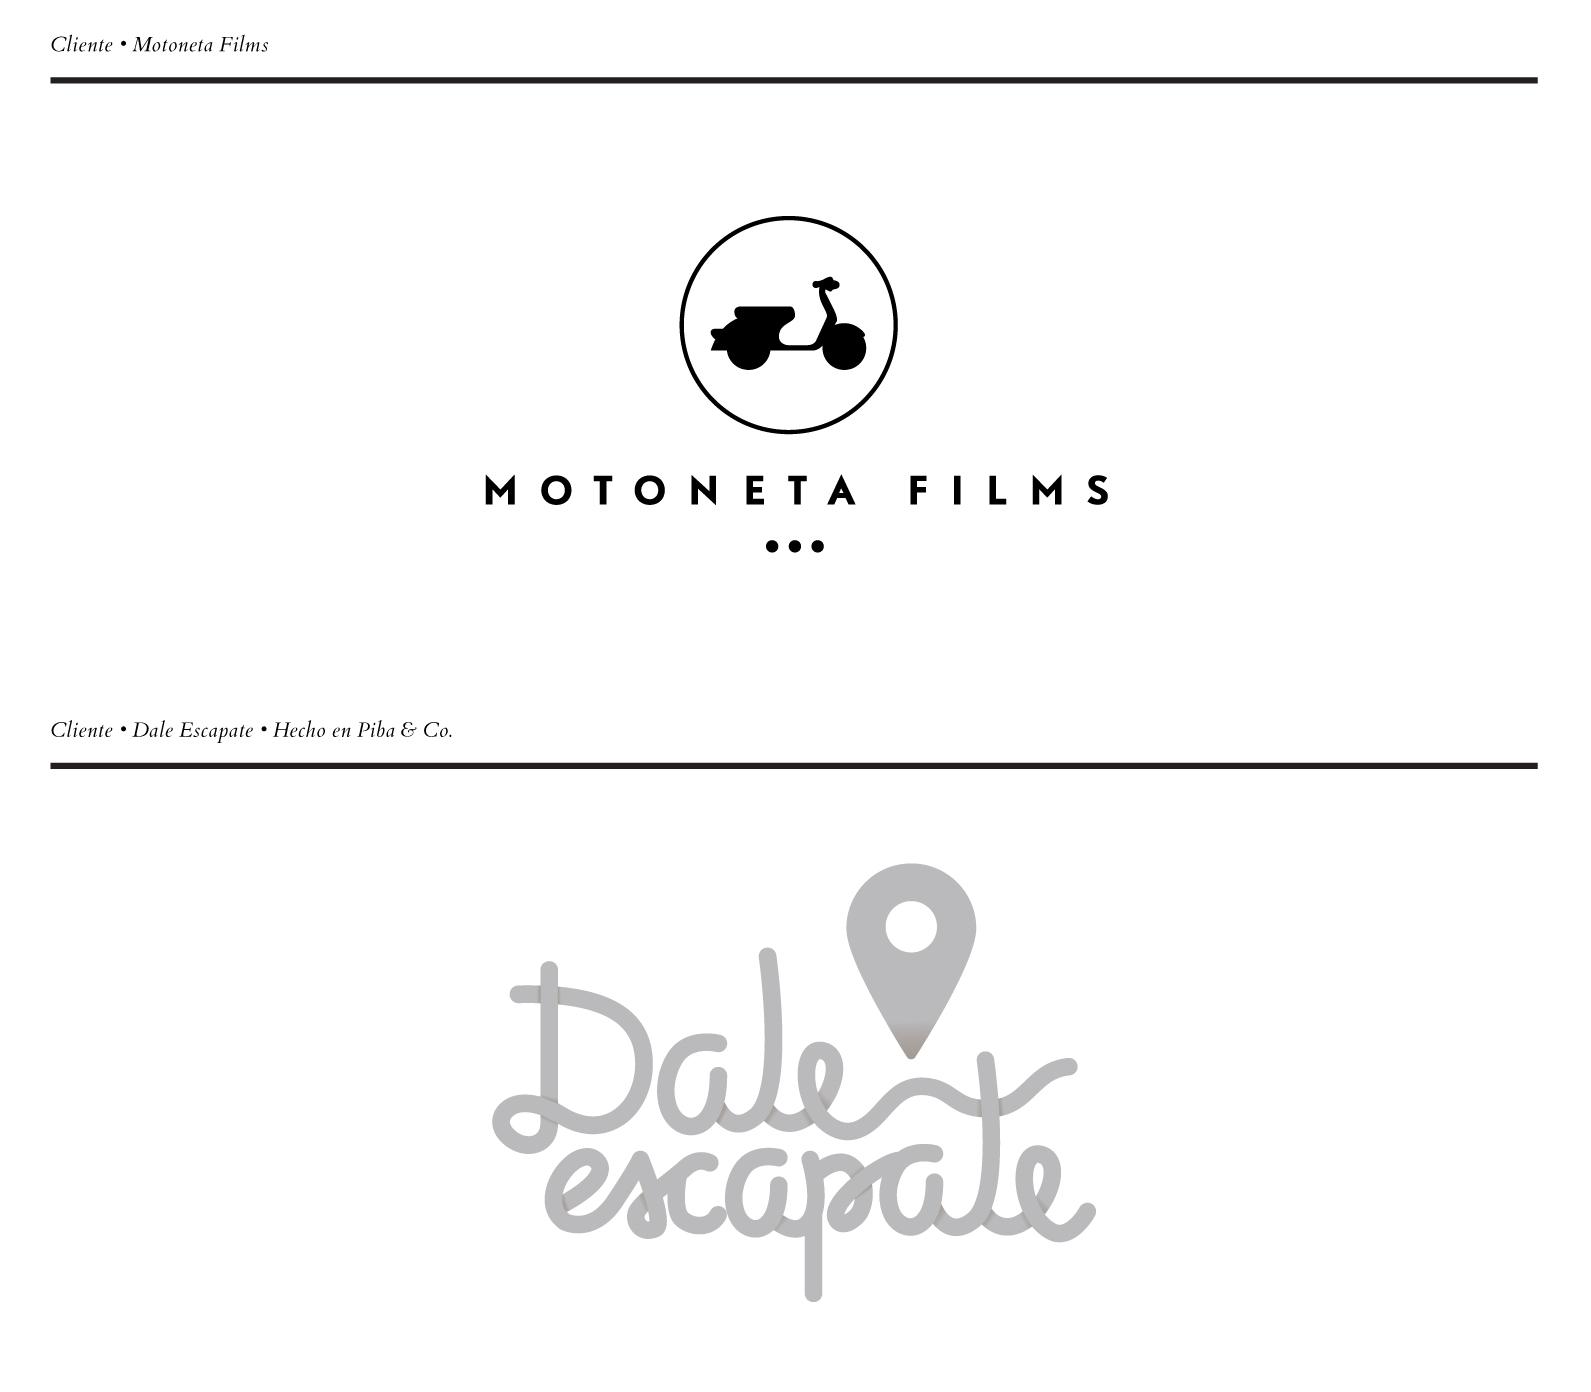 logos-2-v2-04